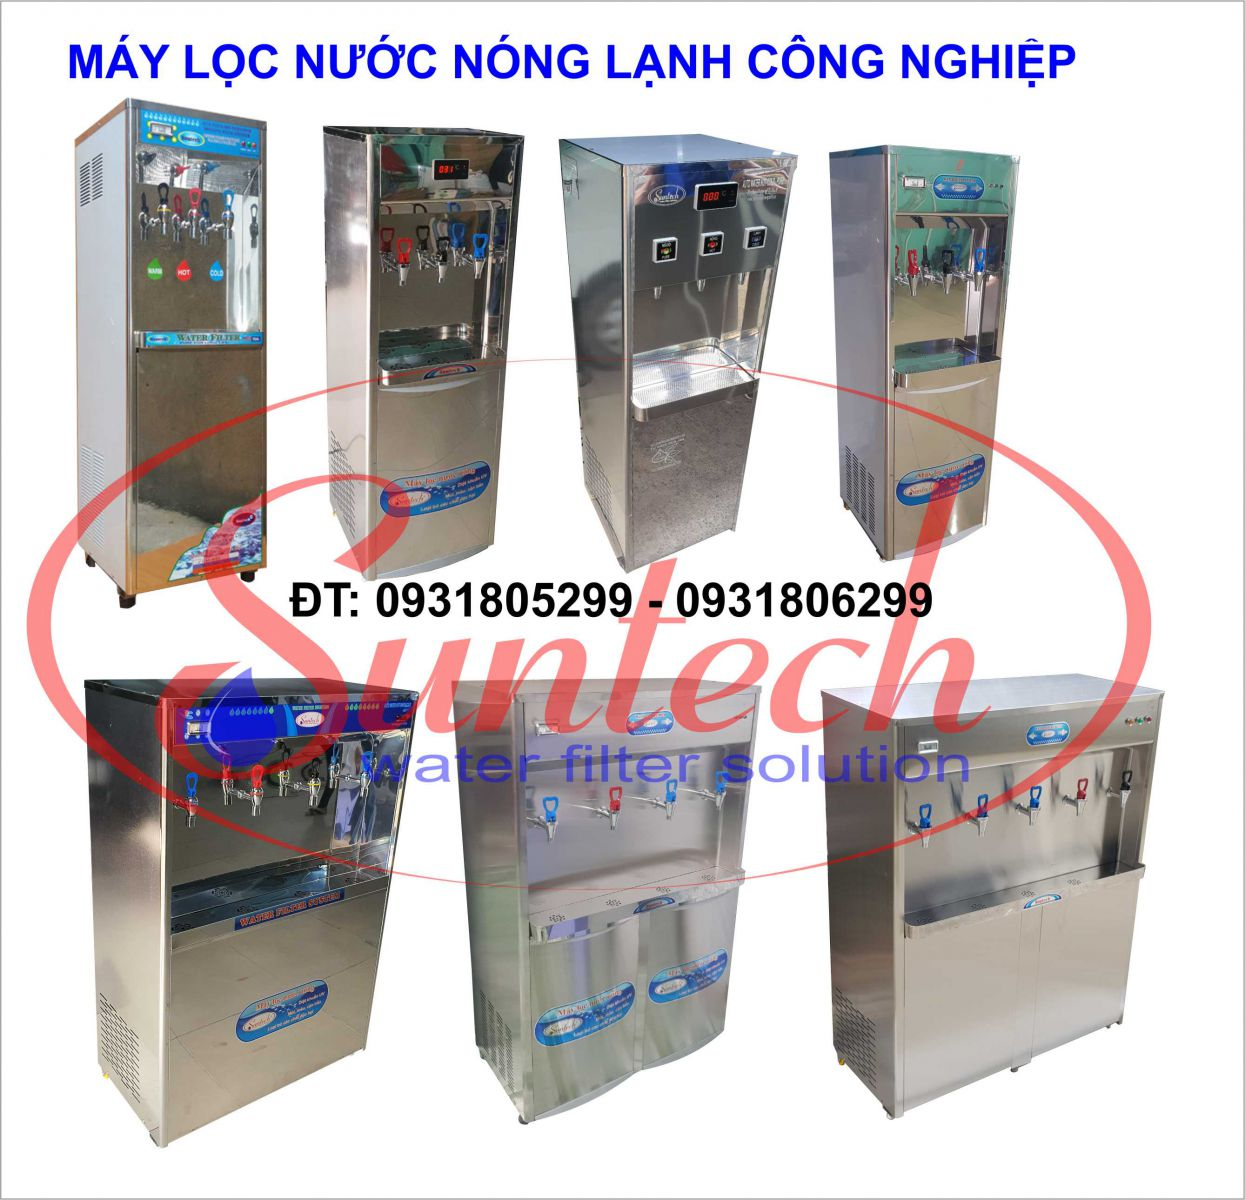 may-loc-nuoc-nong-lanh-cong-nghiep